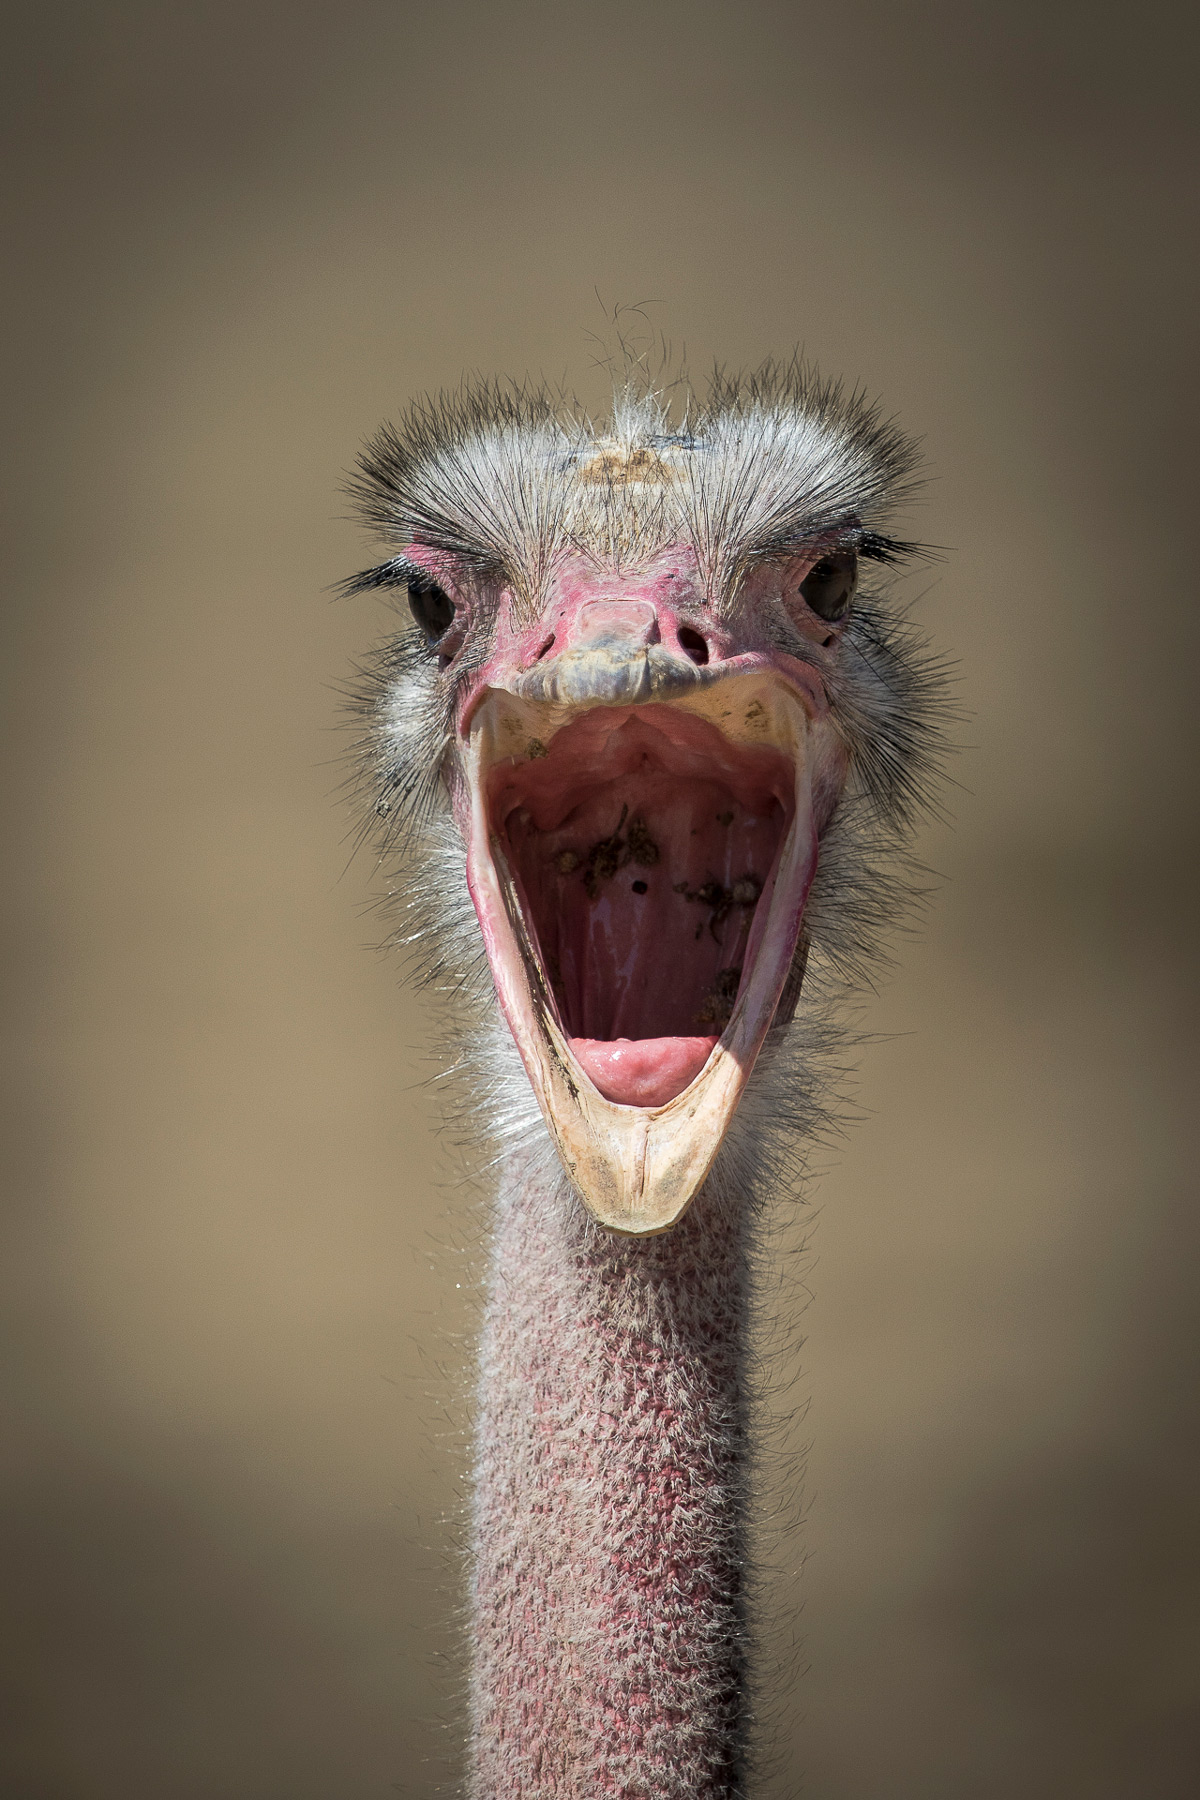 """The revolt of the ostrich"" – Maasai Mara National Reserve, Kenya © Patrice Quillard"